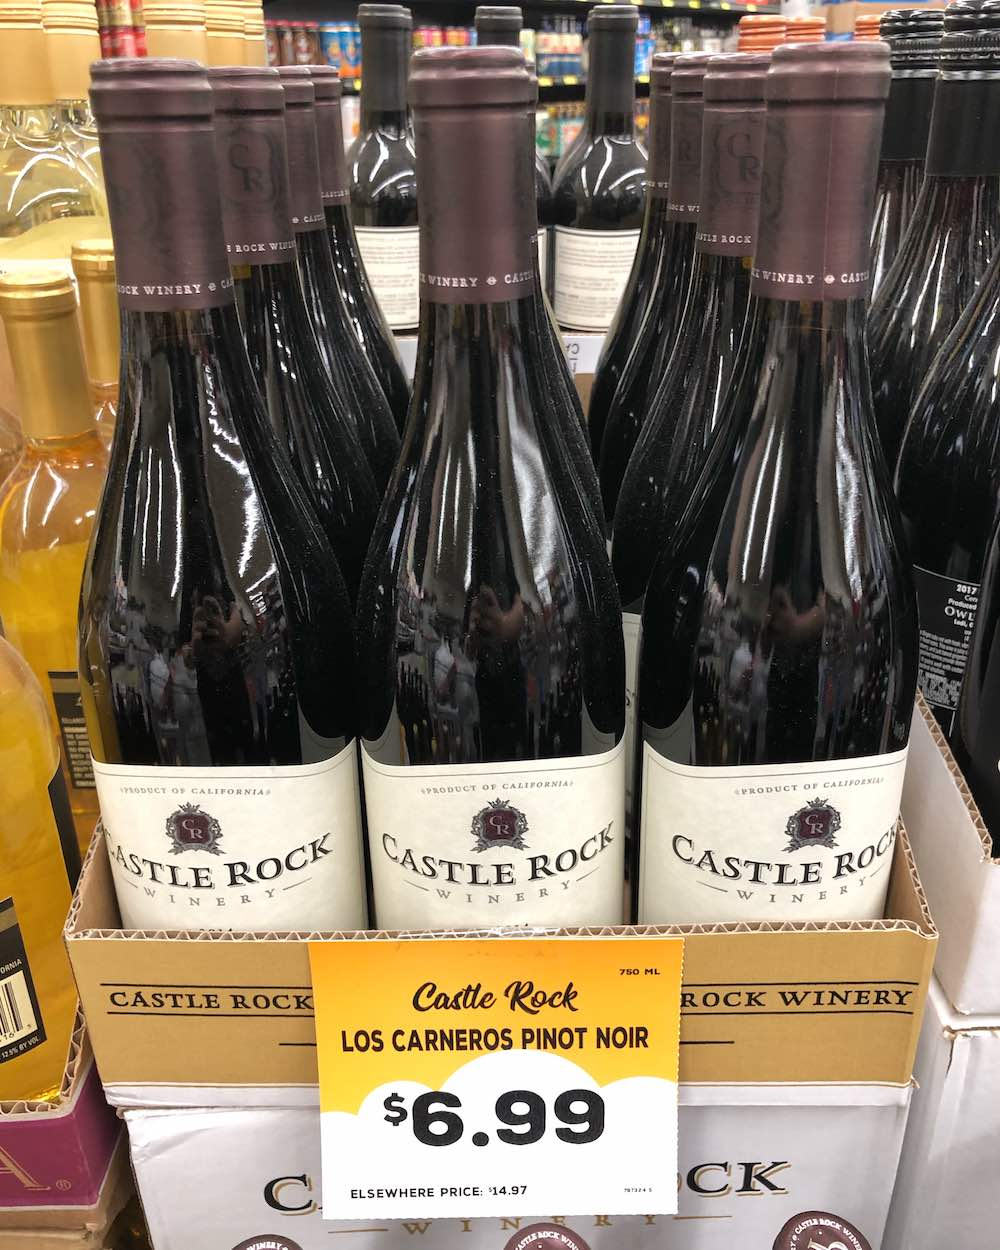 Grocery Outlet Wine - Castle Rock 2014 Los Carneros Pinot Noir